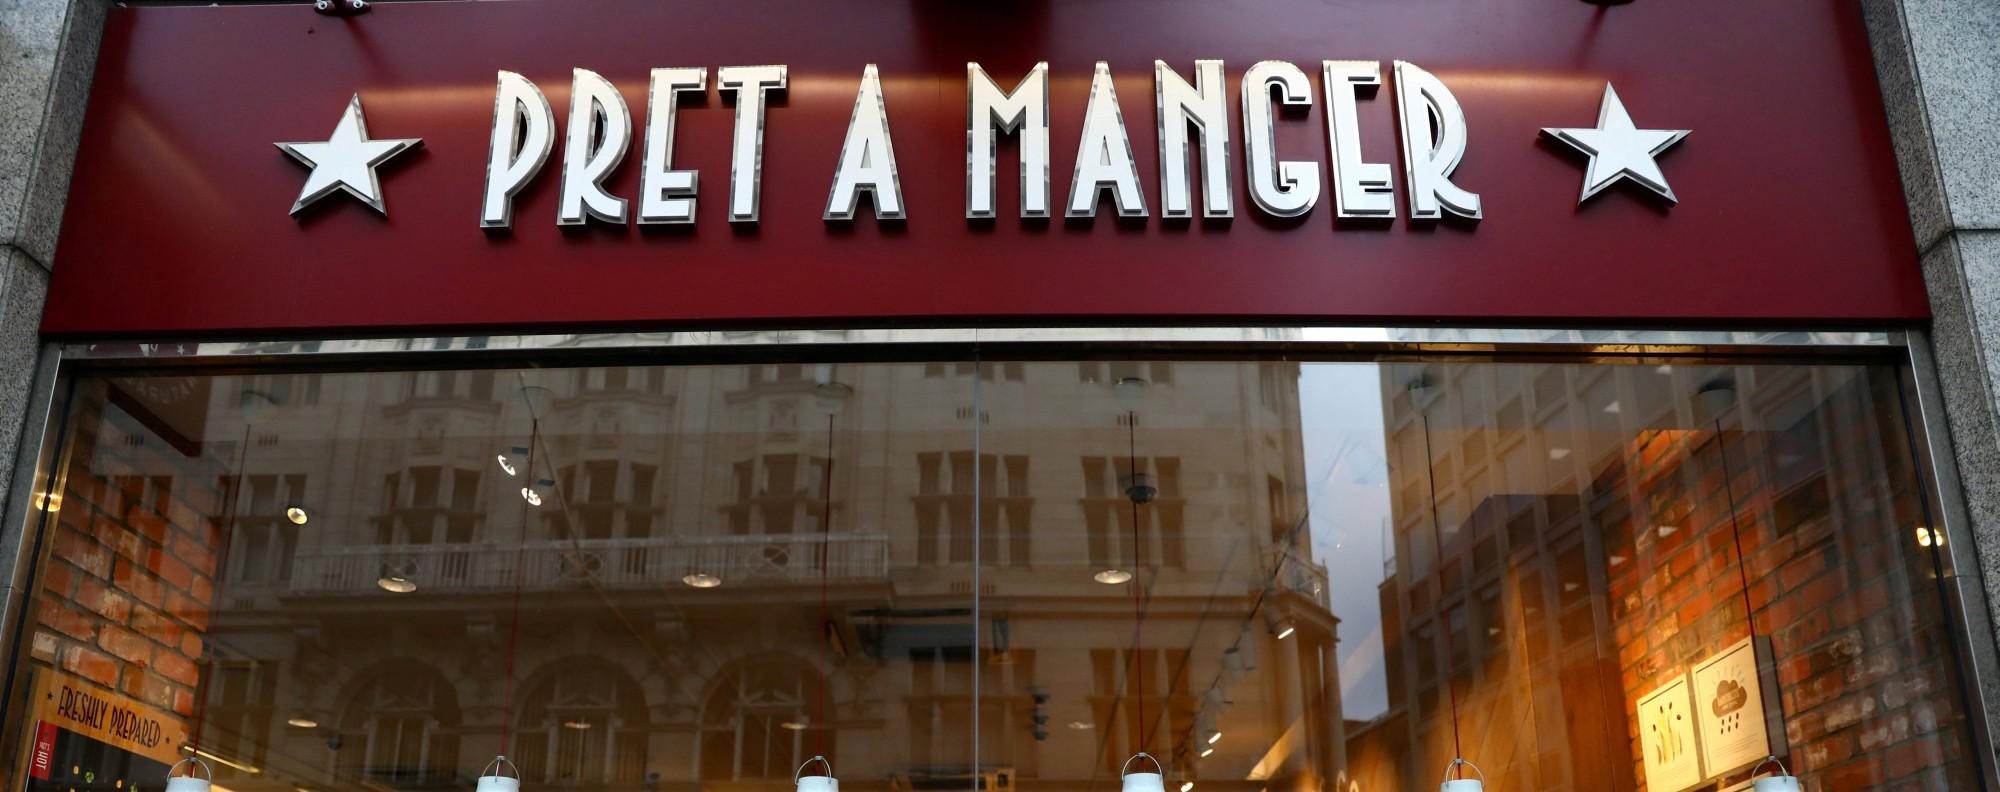 pret a manger marketing strategy